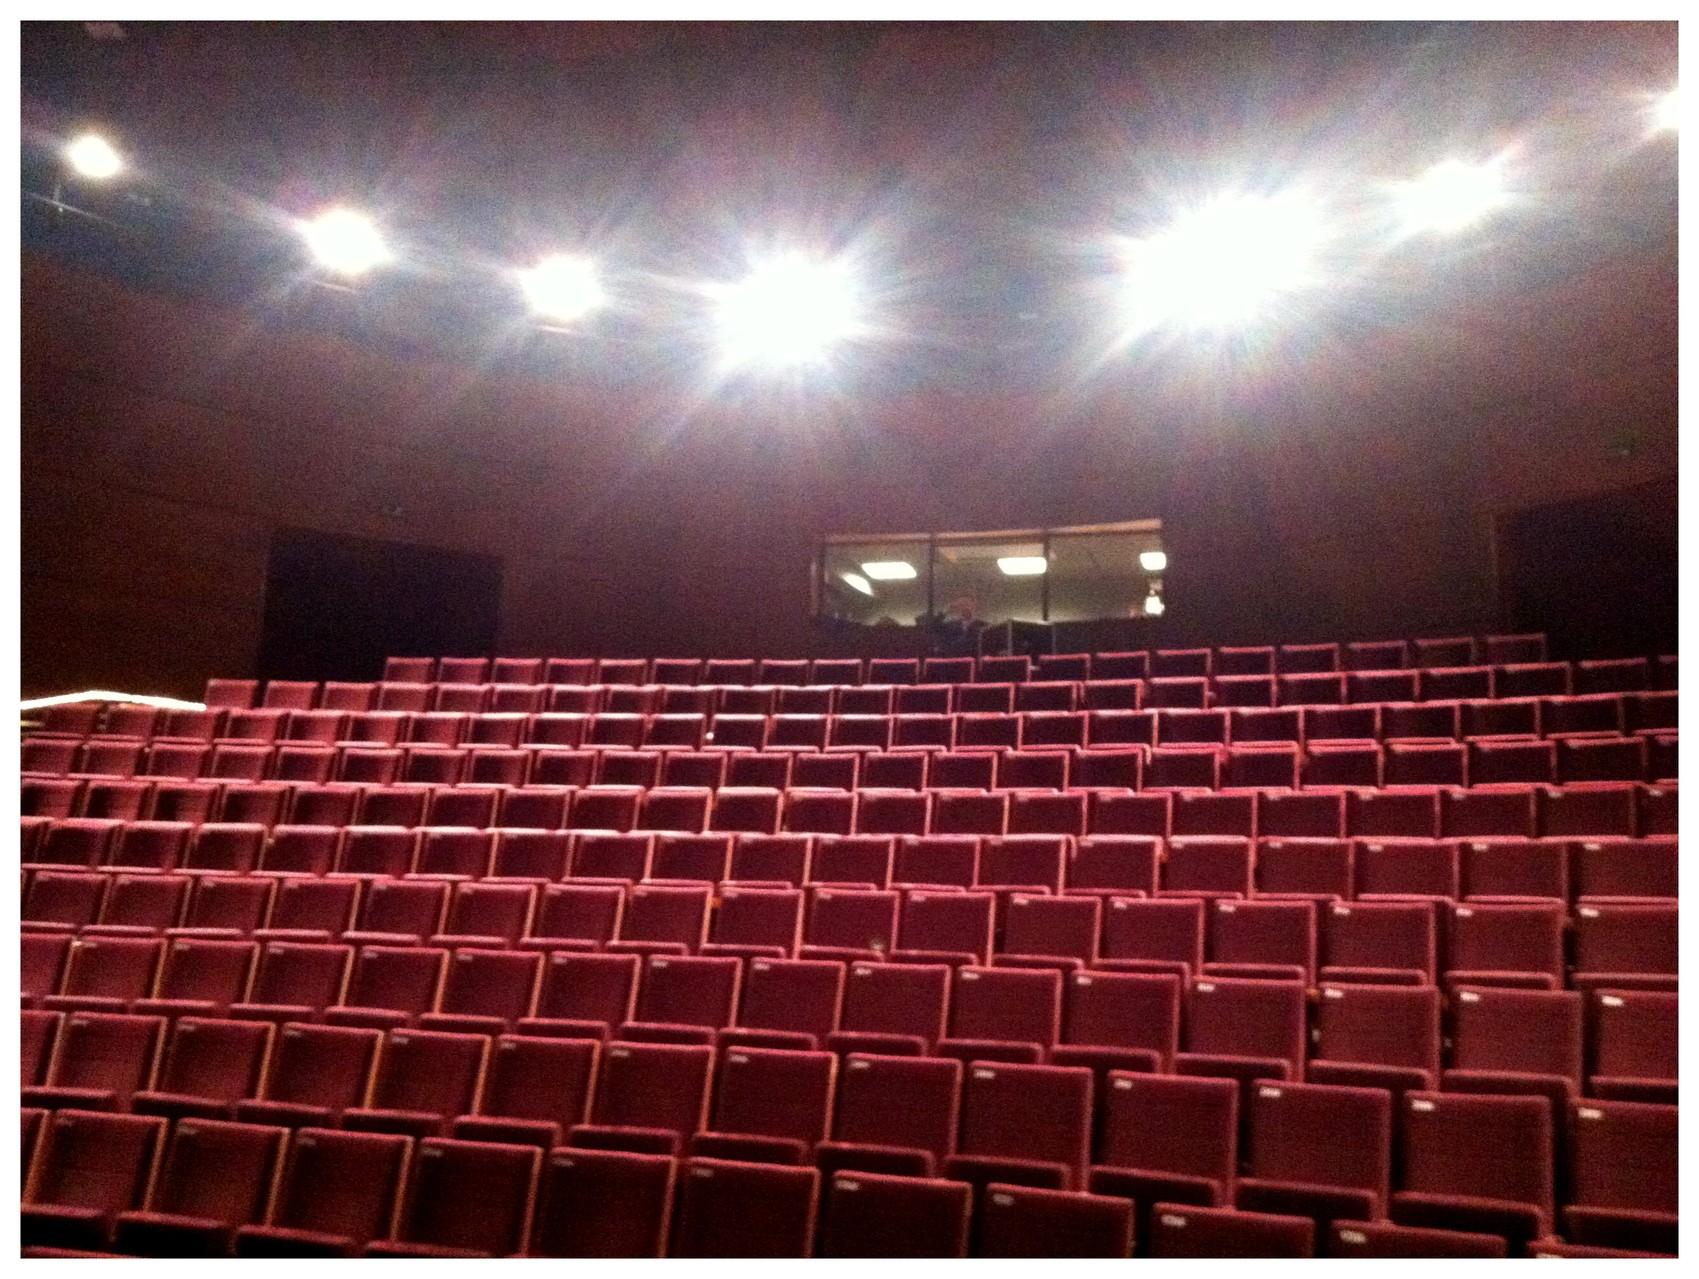 Live at Théâtre d'Orléans - October 2013